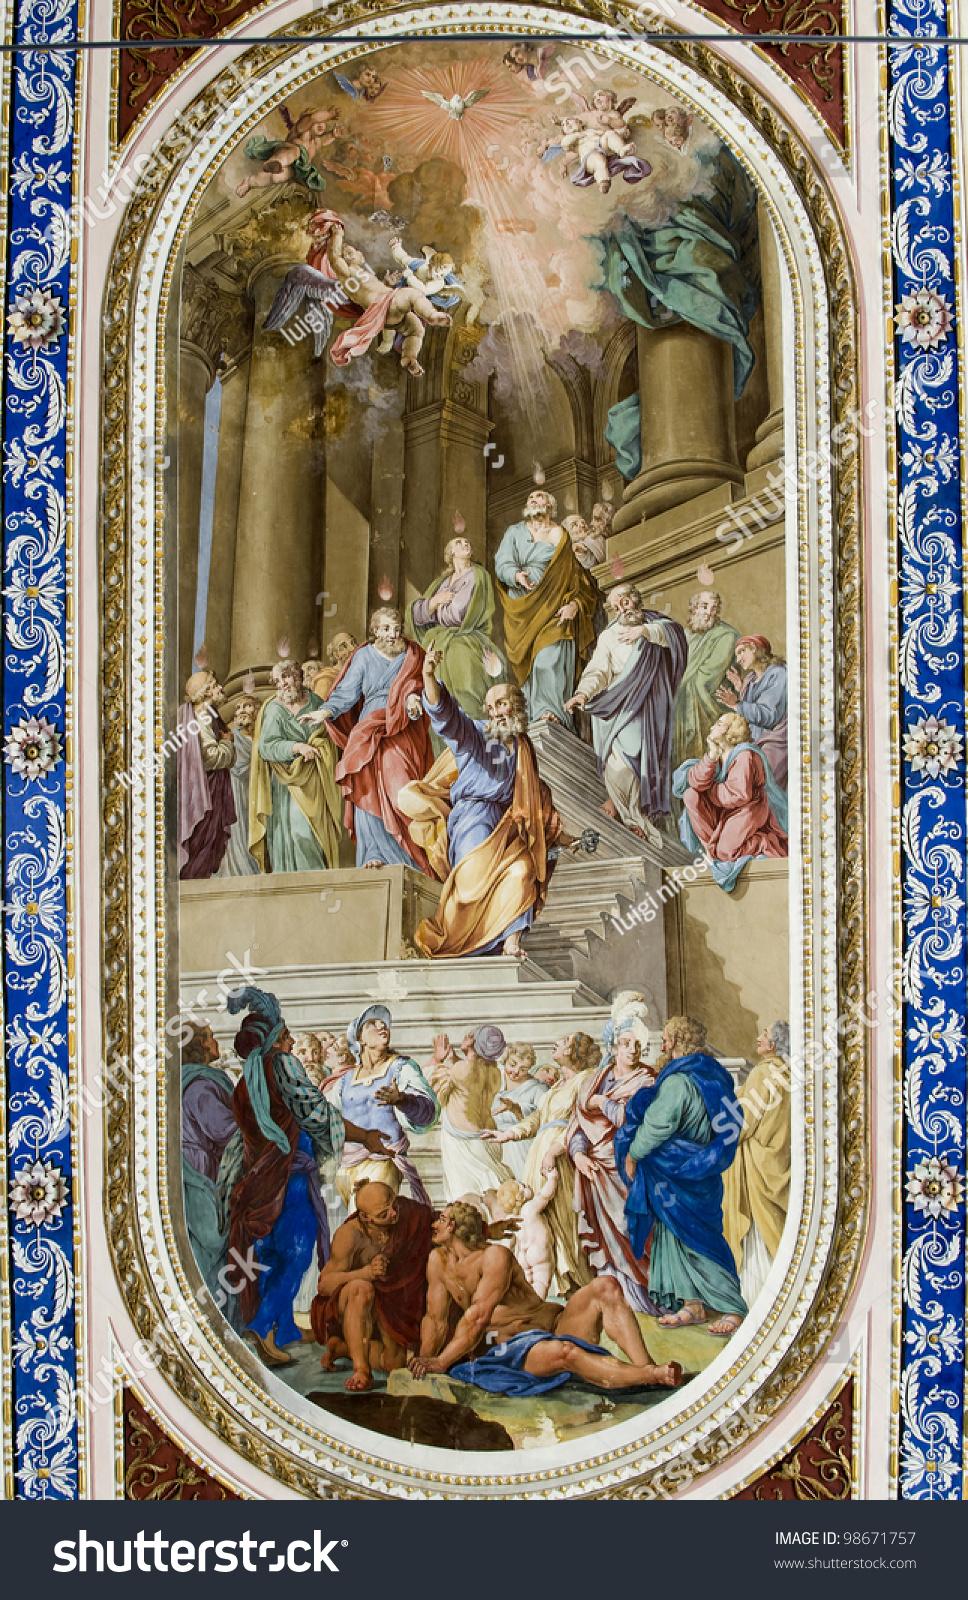 Europe italy sicily noto siracusa fresco stock photo for Baroque italien